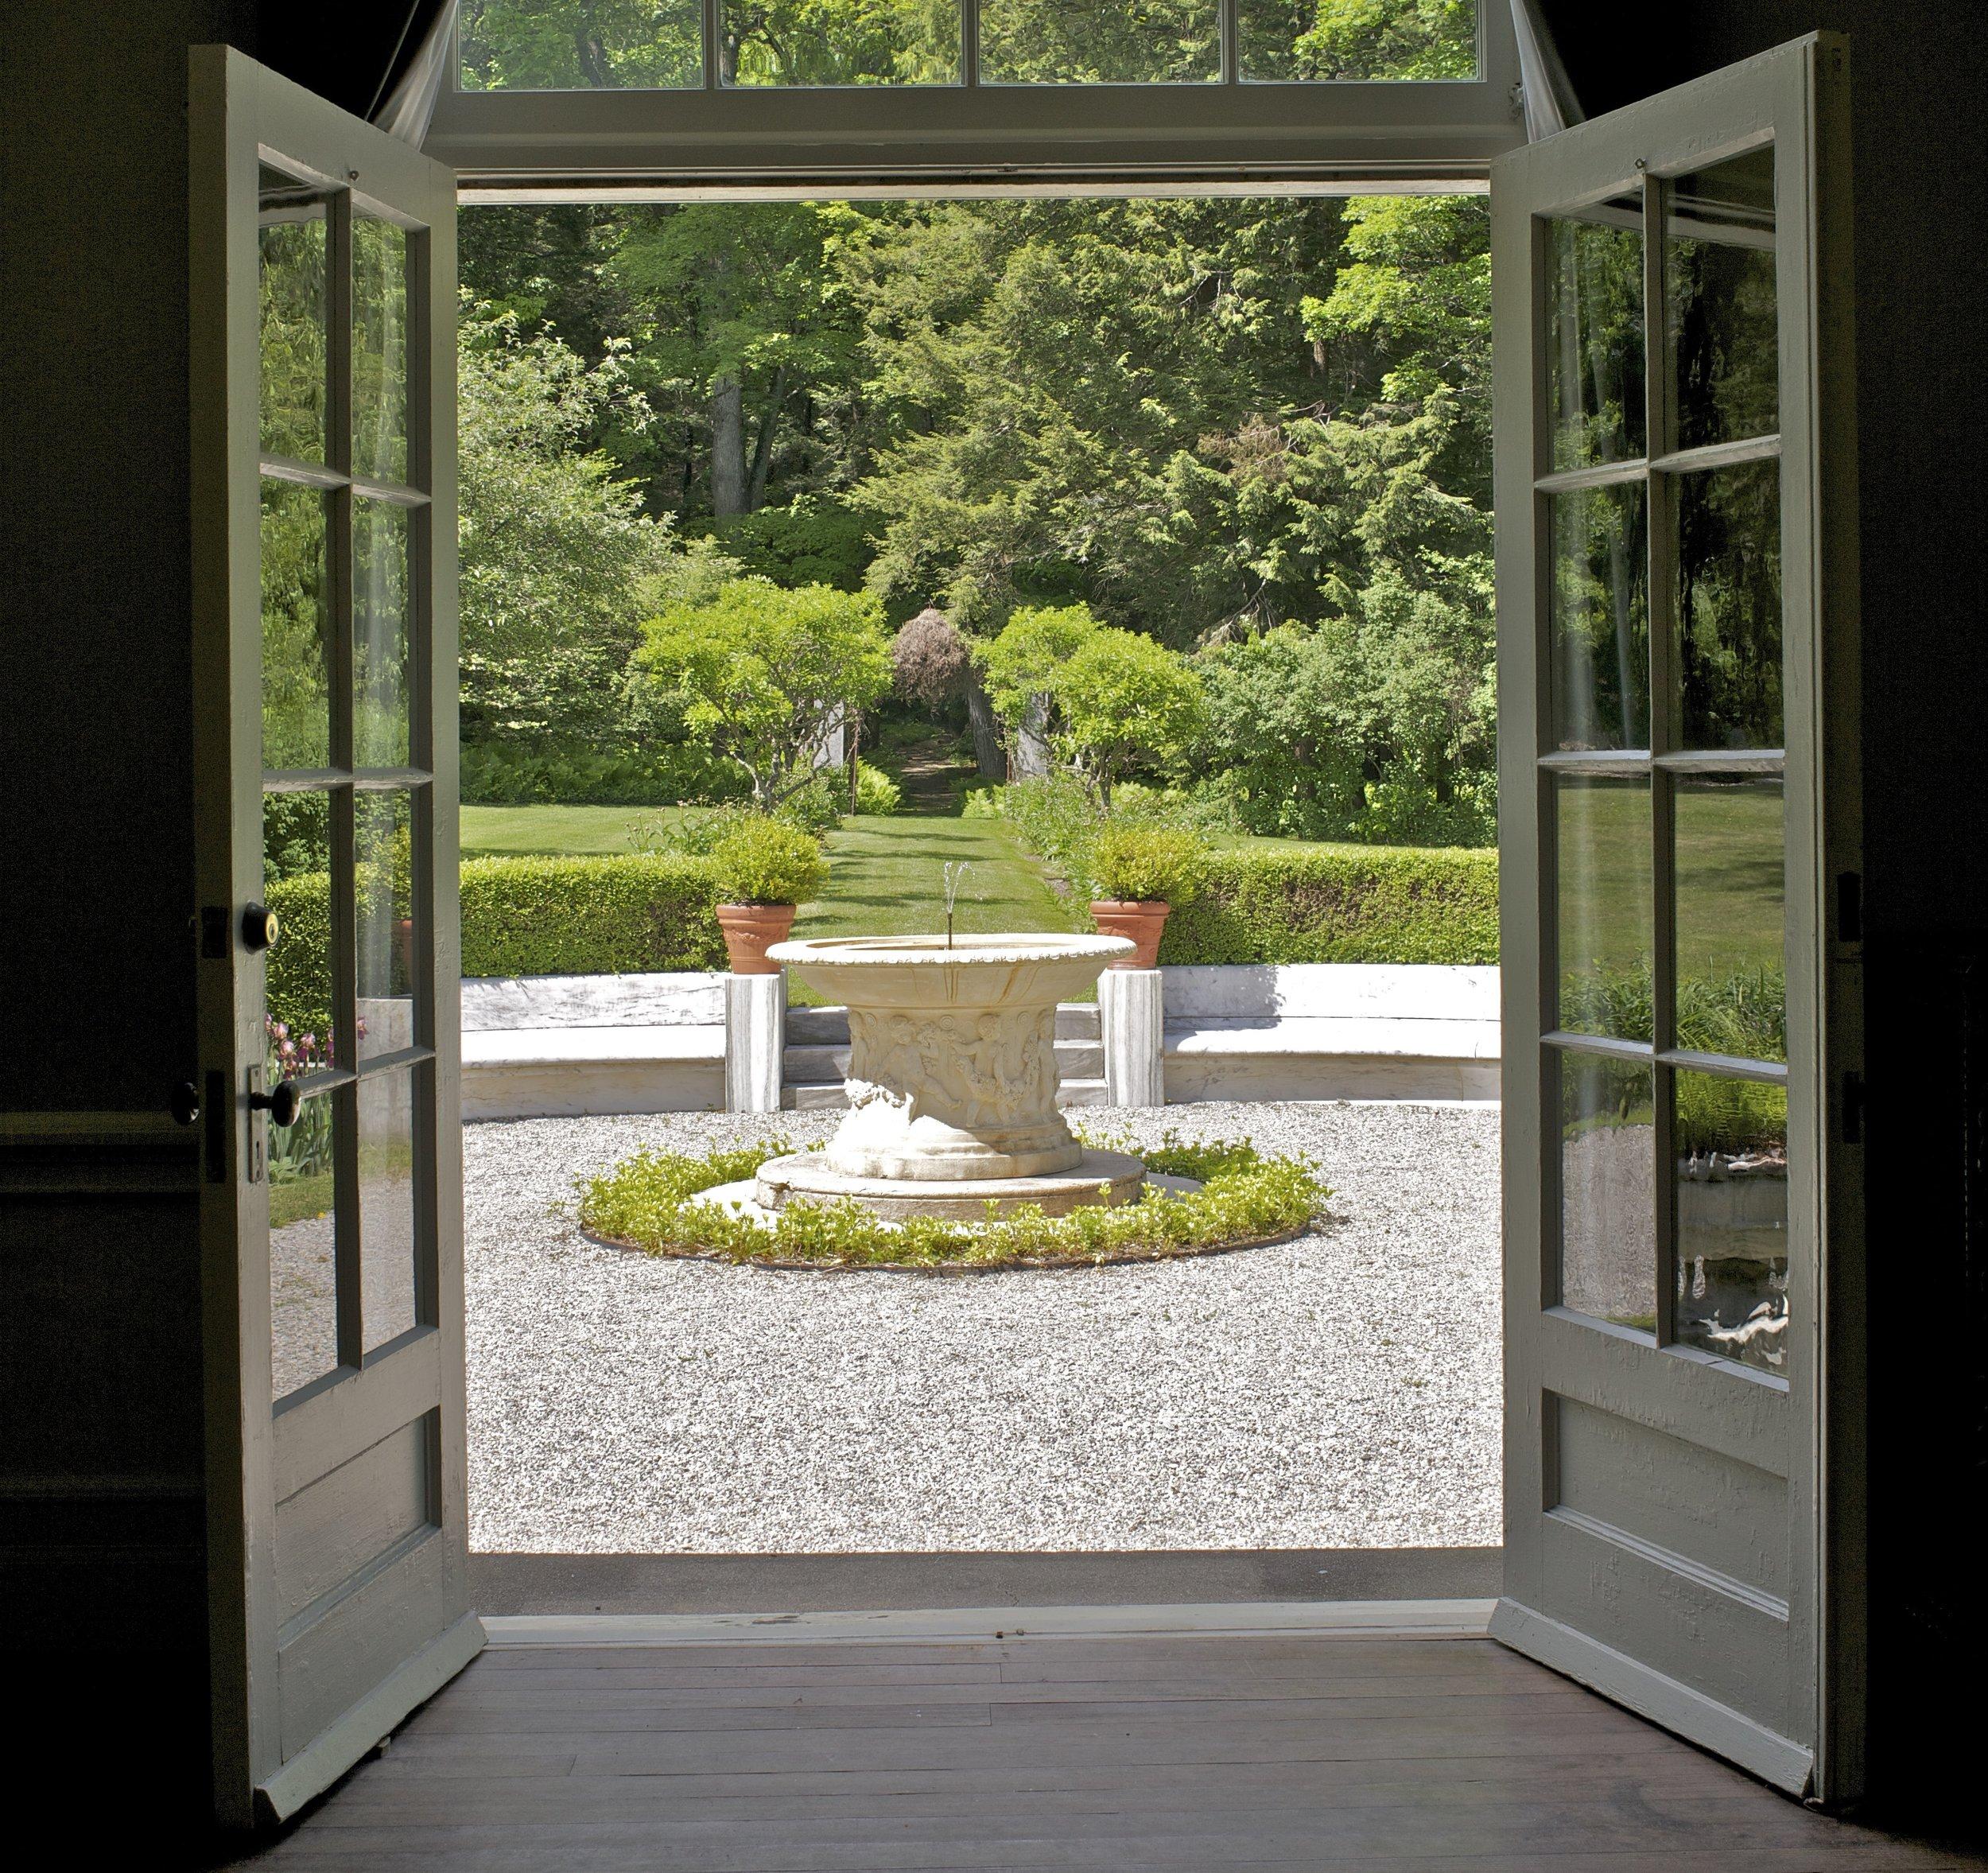 Garden and fountain through studio north doors cropped.jpg